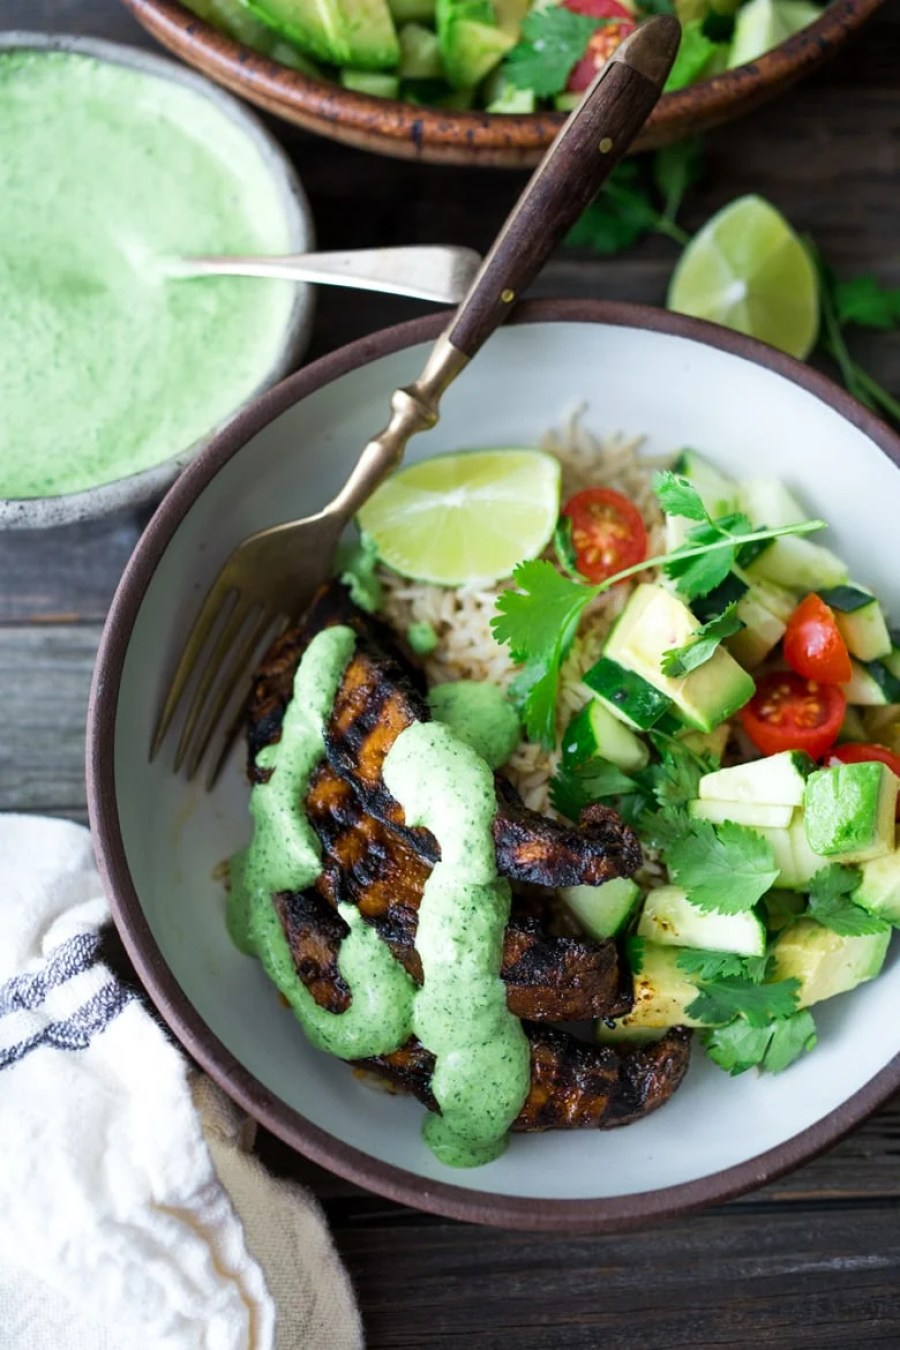 Grilled Peruvian Portobellos with Spicy Green Sauce and Avocado Tomato Salad! | www.feastingathome.com